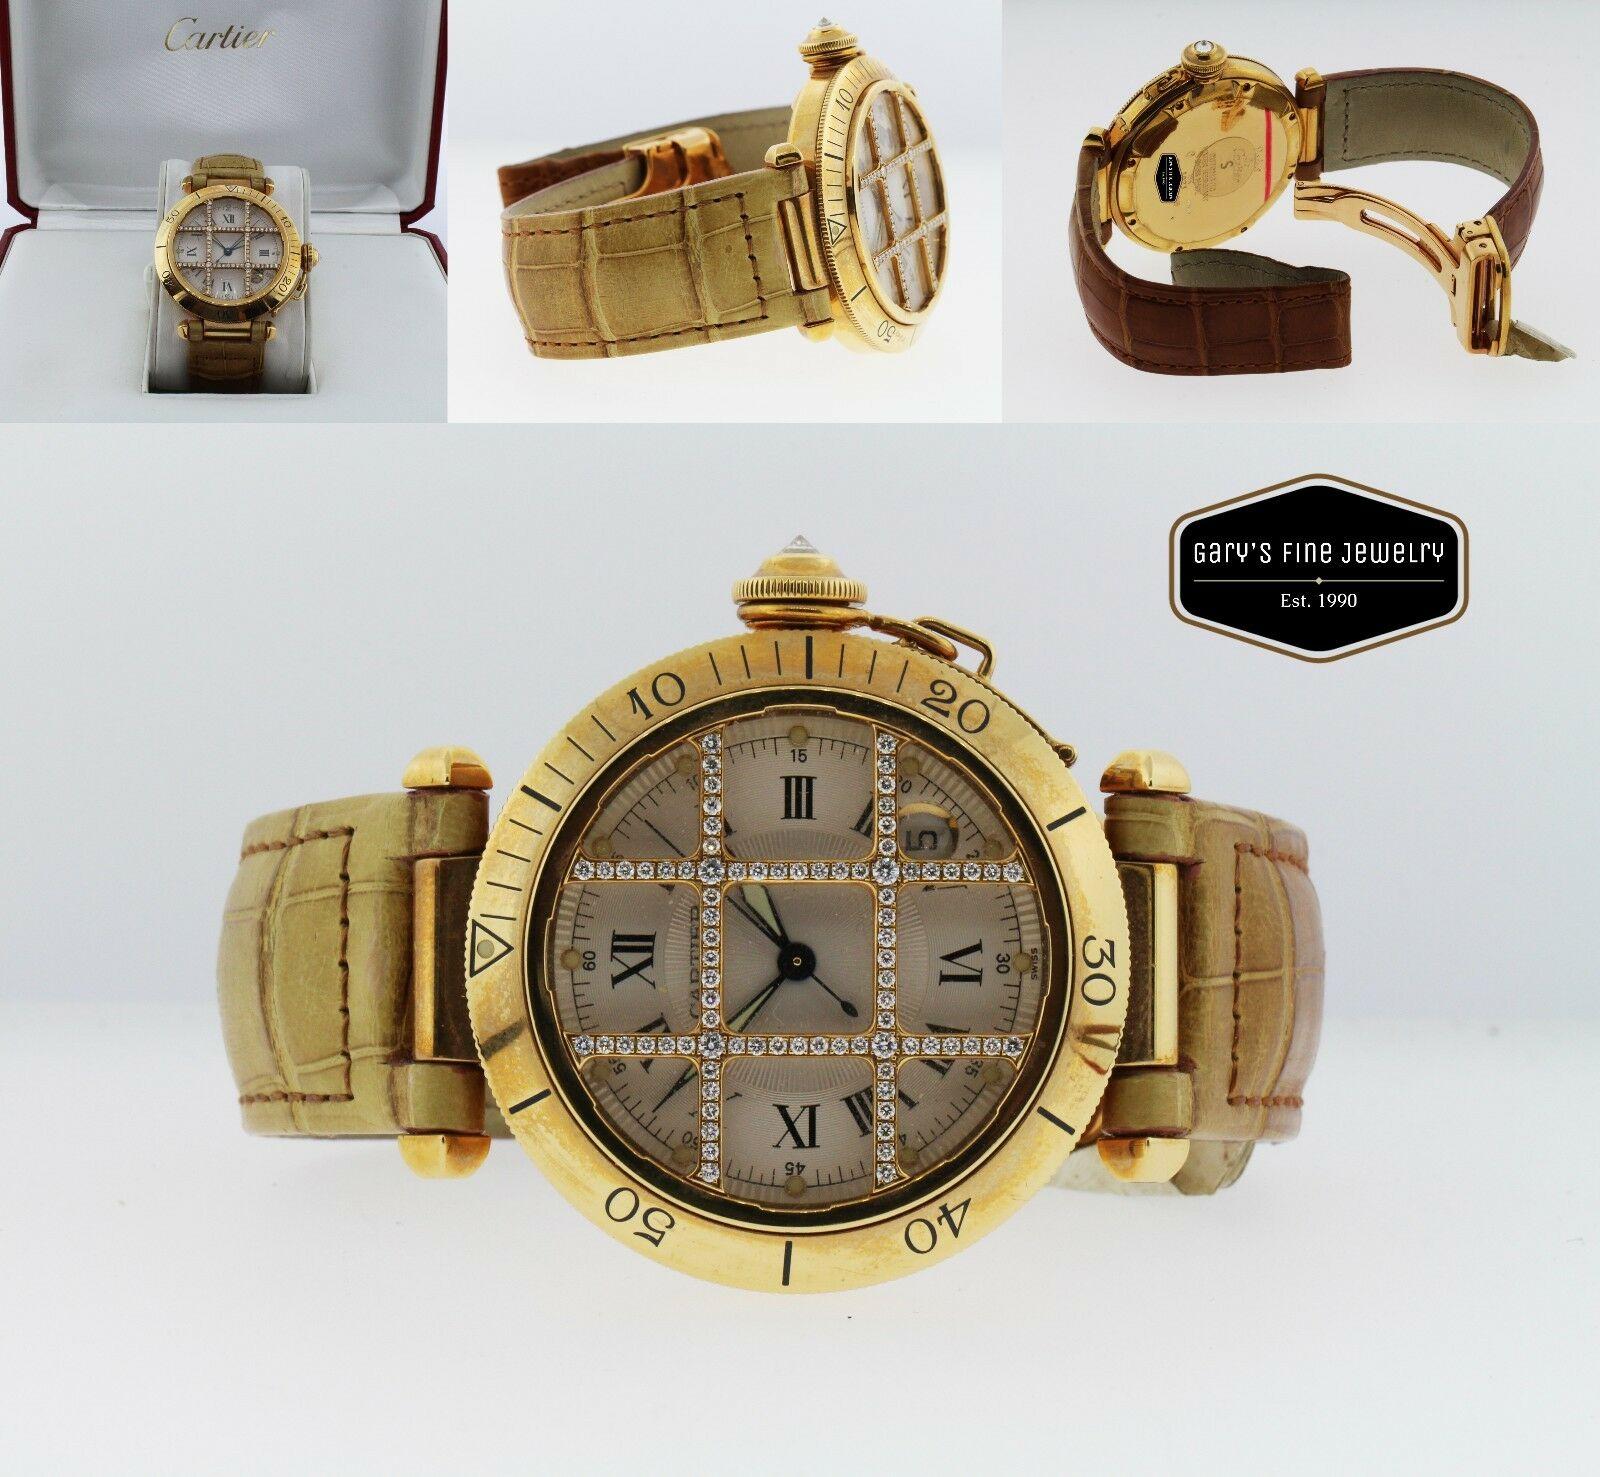 CARTIER Pasha 38MM Model 1023 18Kt Yellow Gold Men's Watch w/ OG Diamond Cage